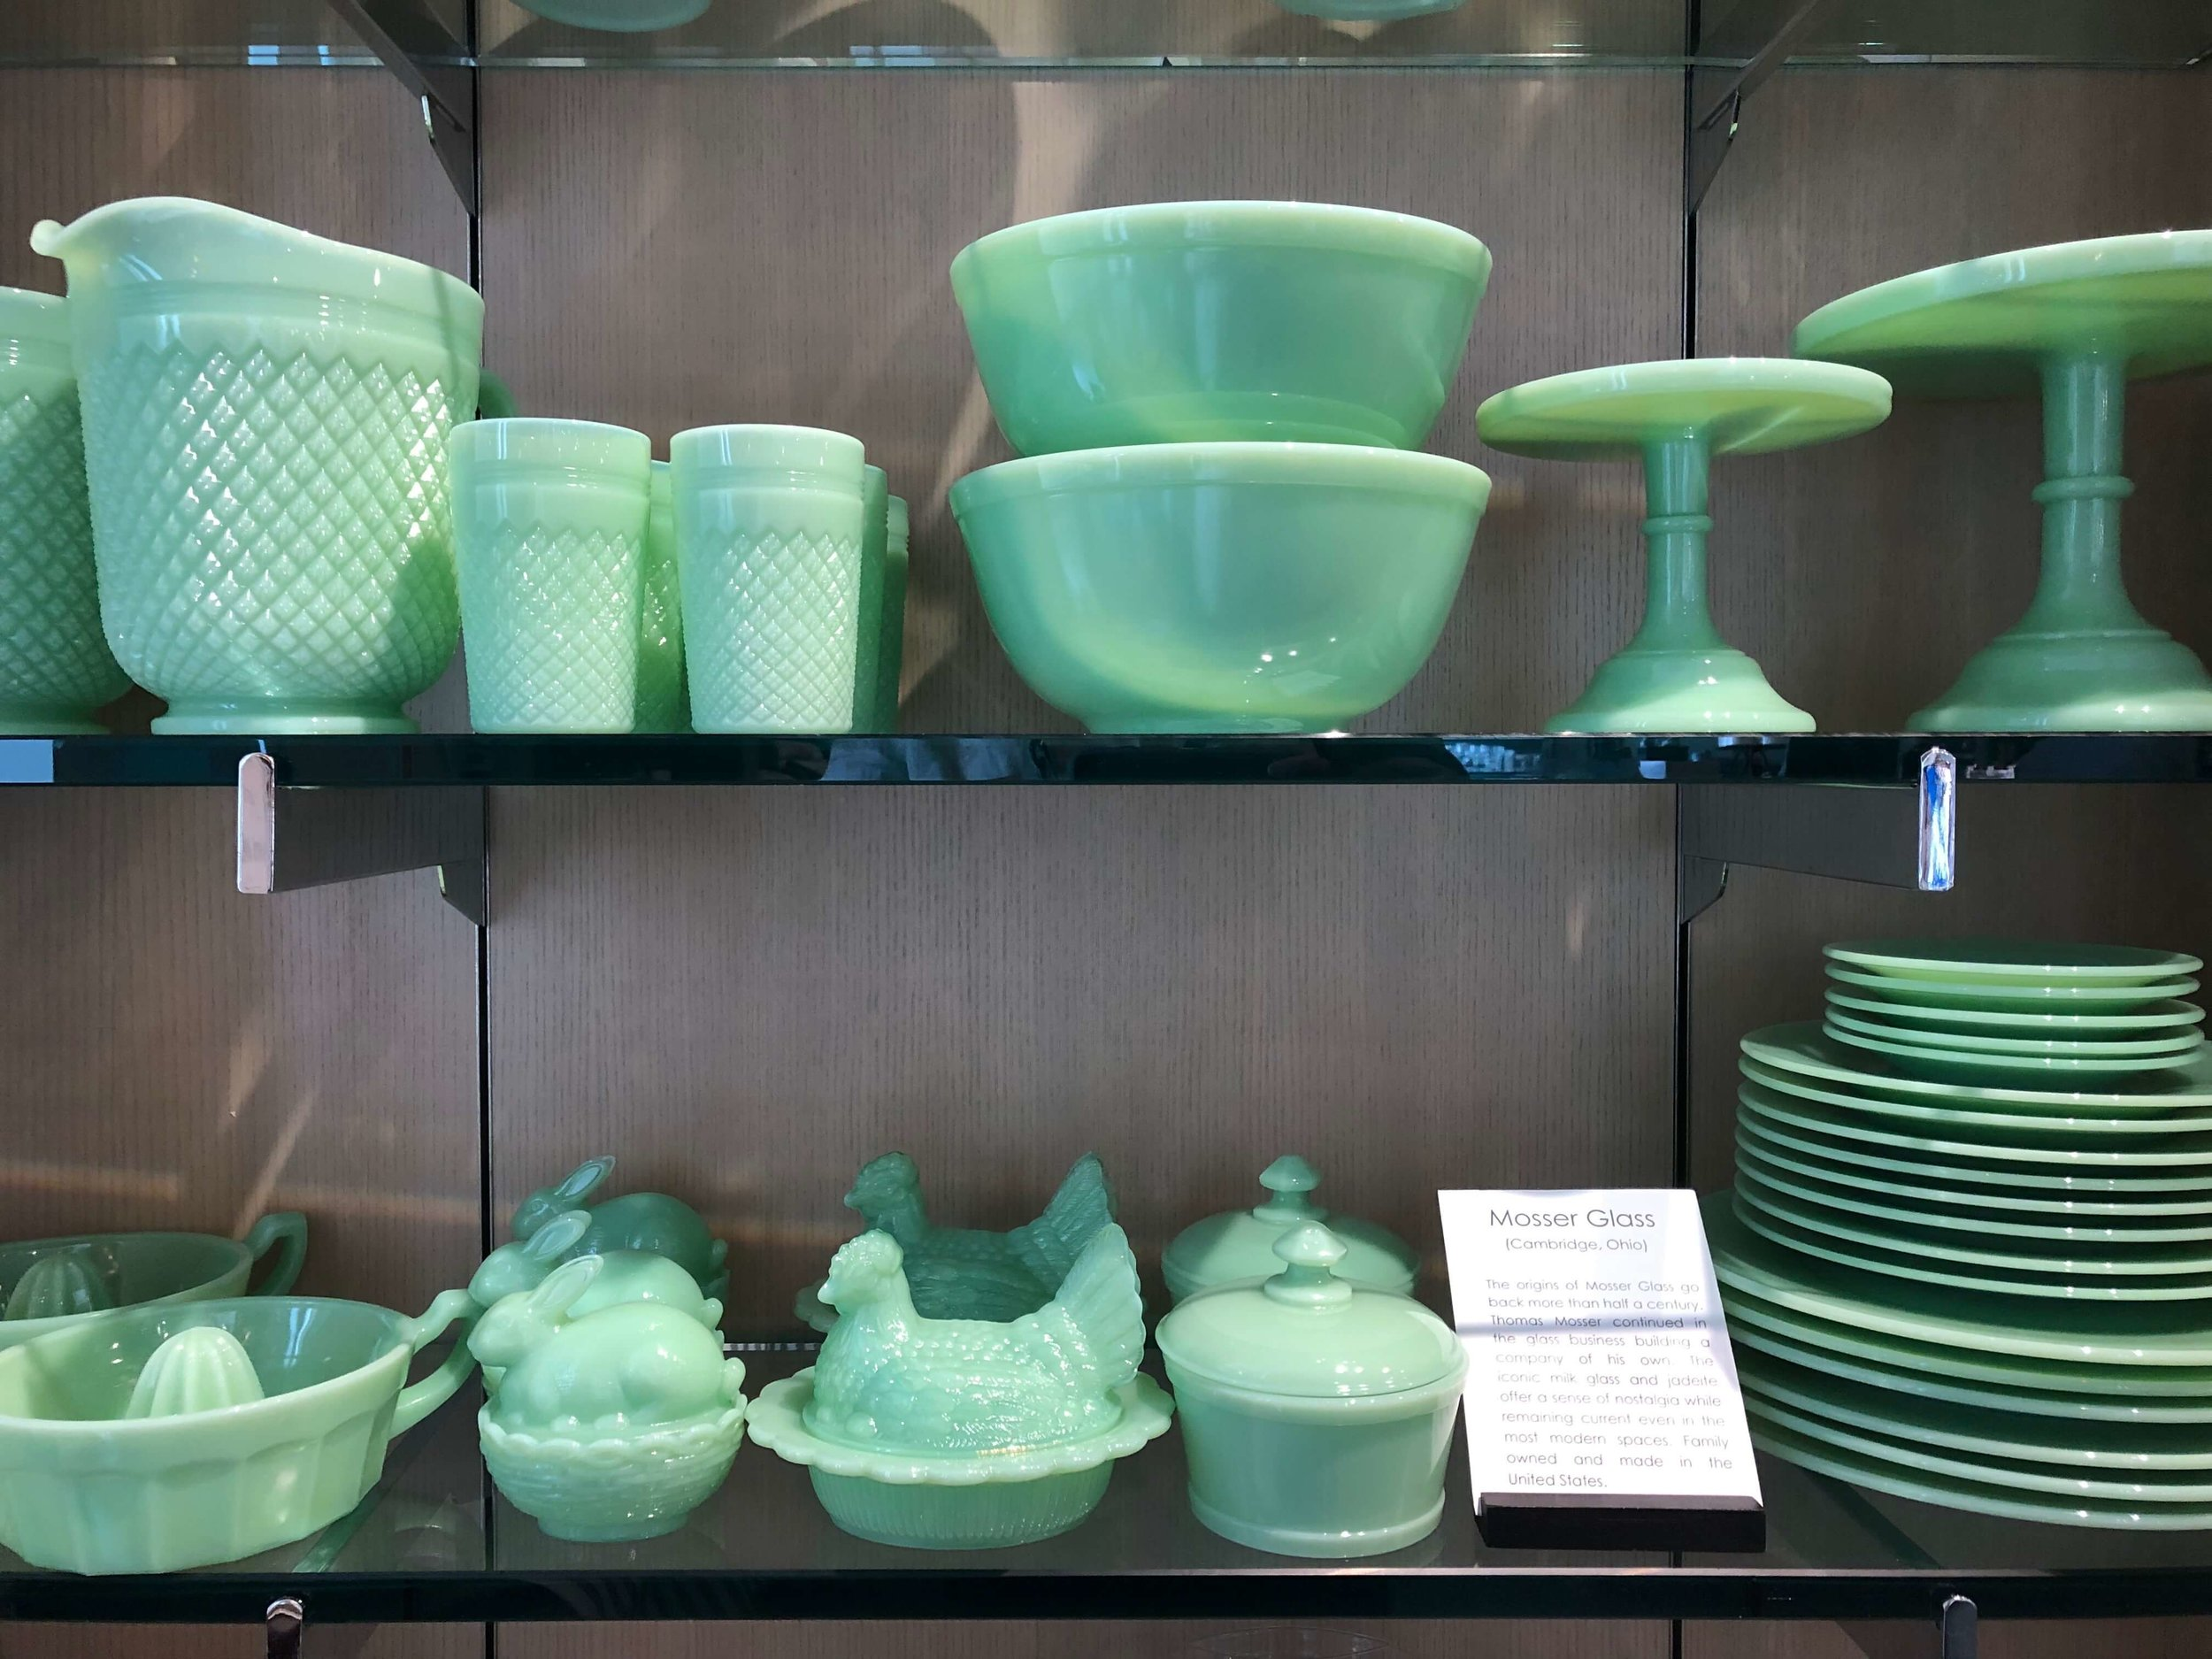 Mosser Glass at the gift shop in the Culinary Institute of America Copia | Napa, California